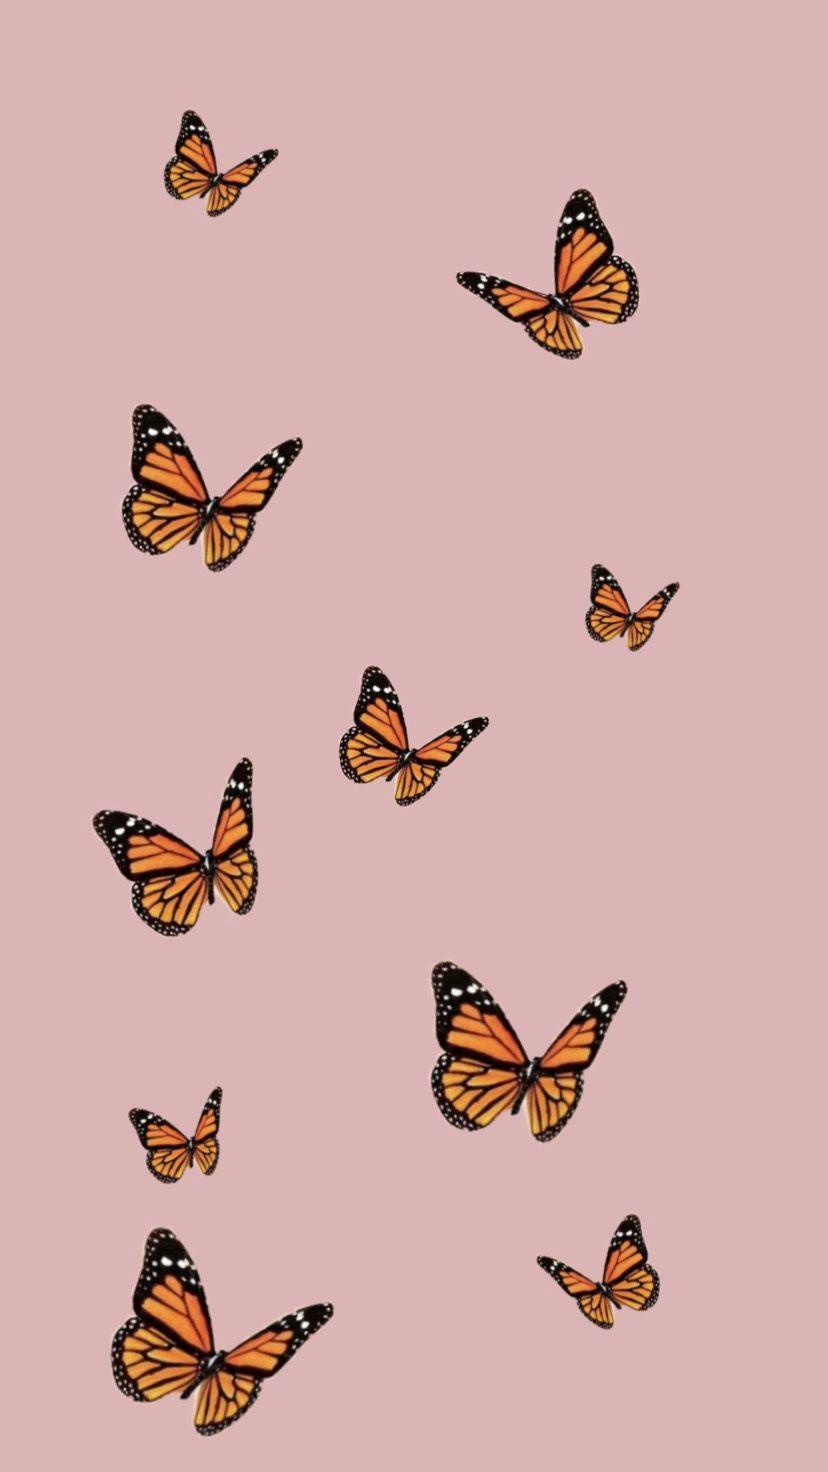 Butterflies Aesthetic Wallpapers Wallpaper Cave